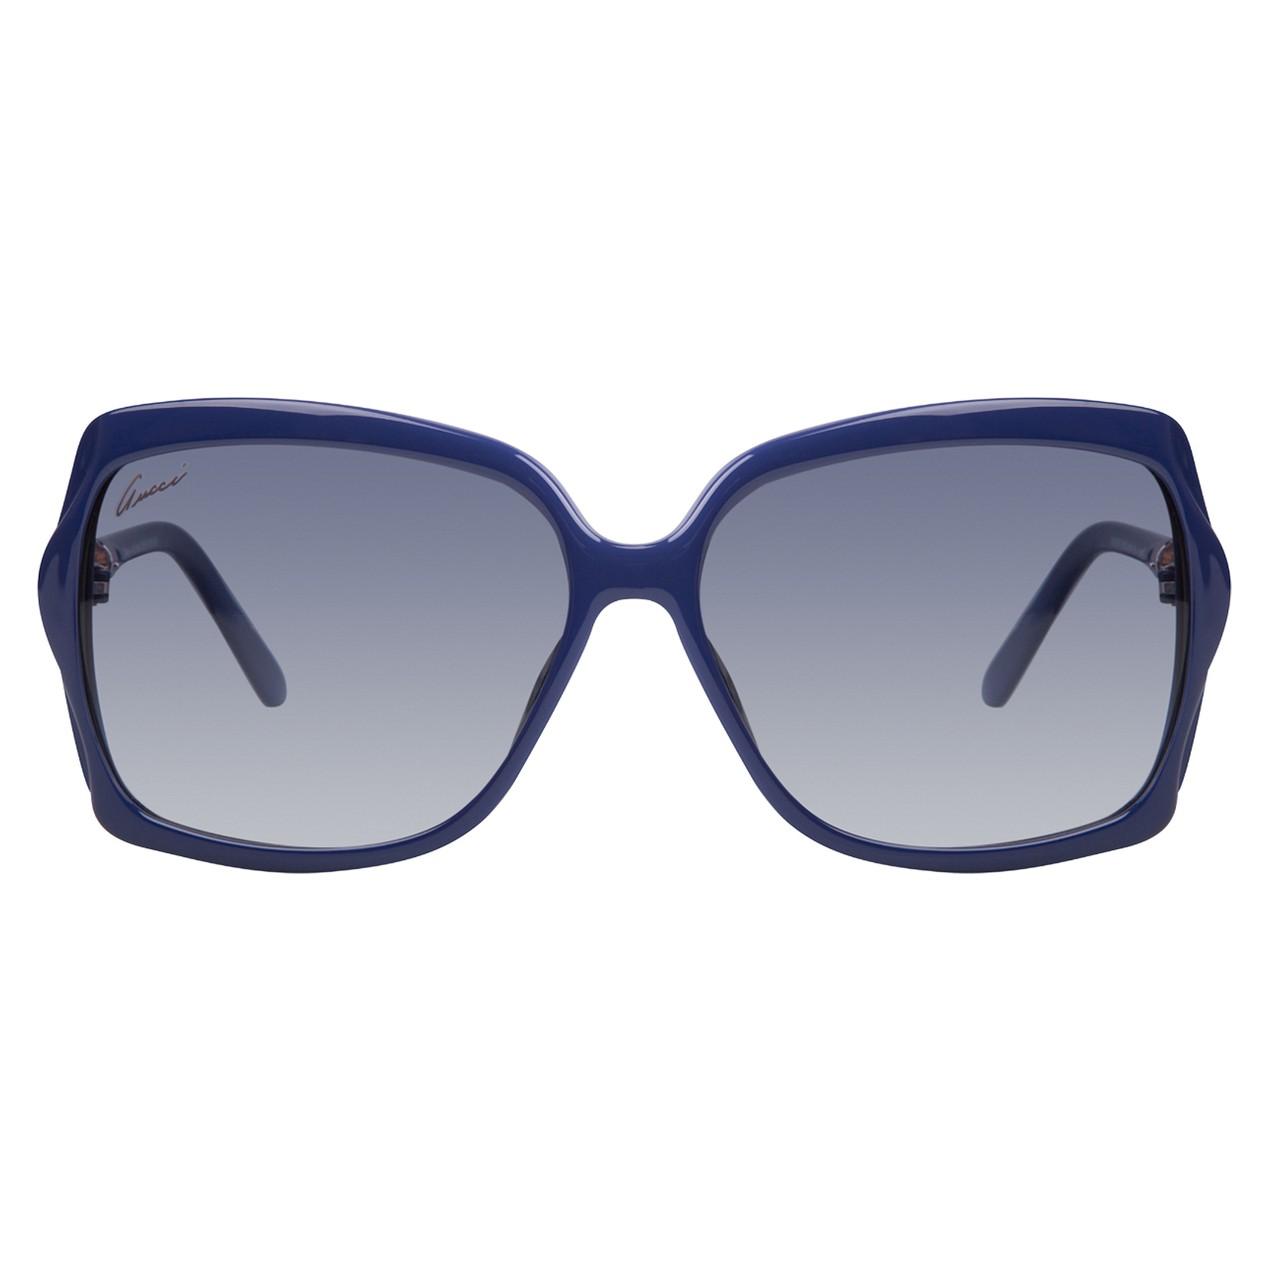 9acdf36a7b1 Gucci GG 3131 S IP1U3 Women s Sunglasses - Tanga